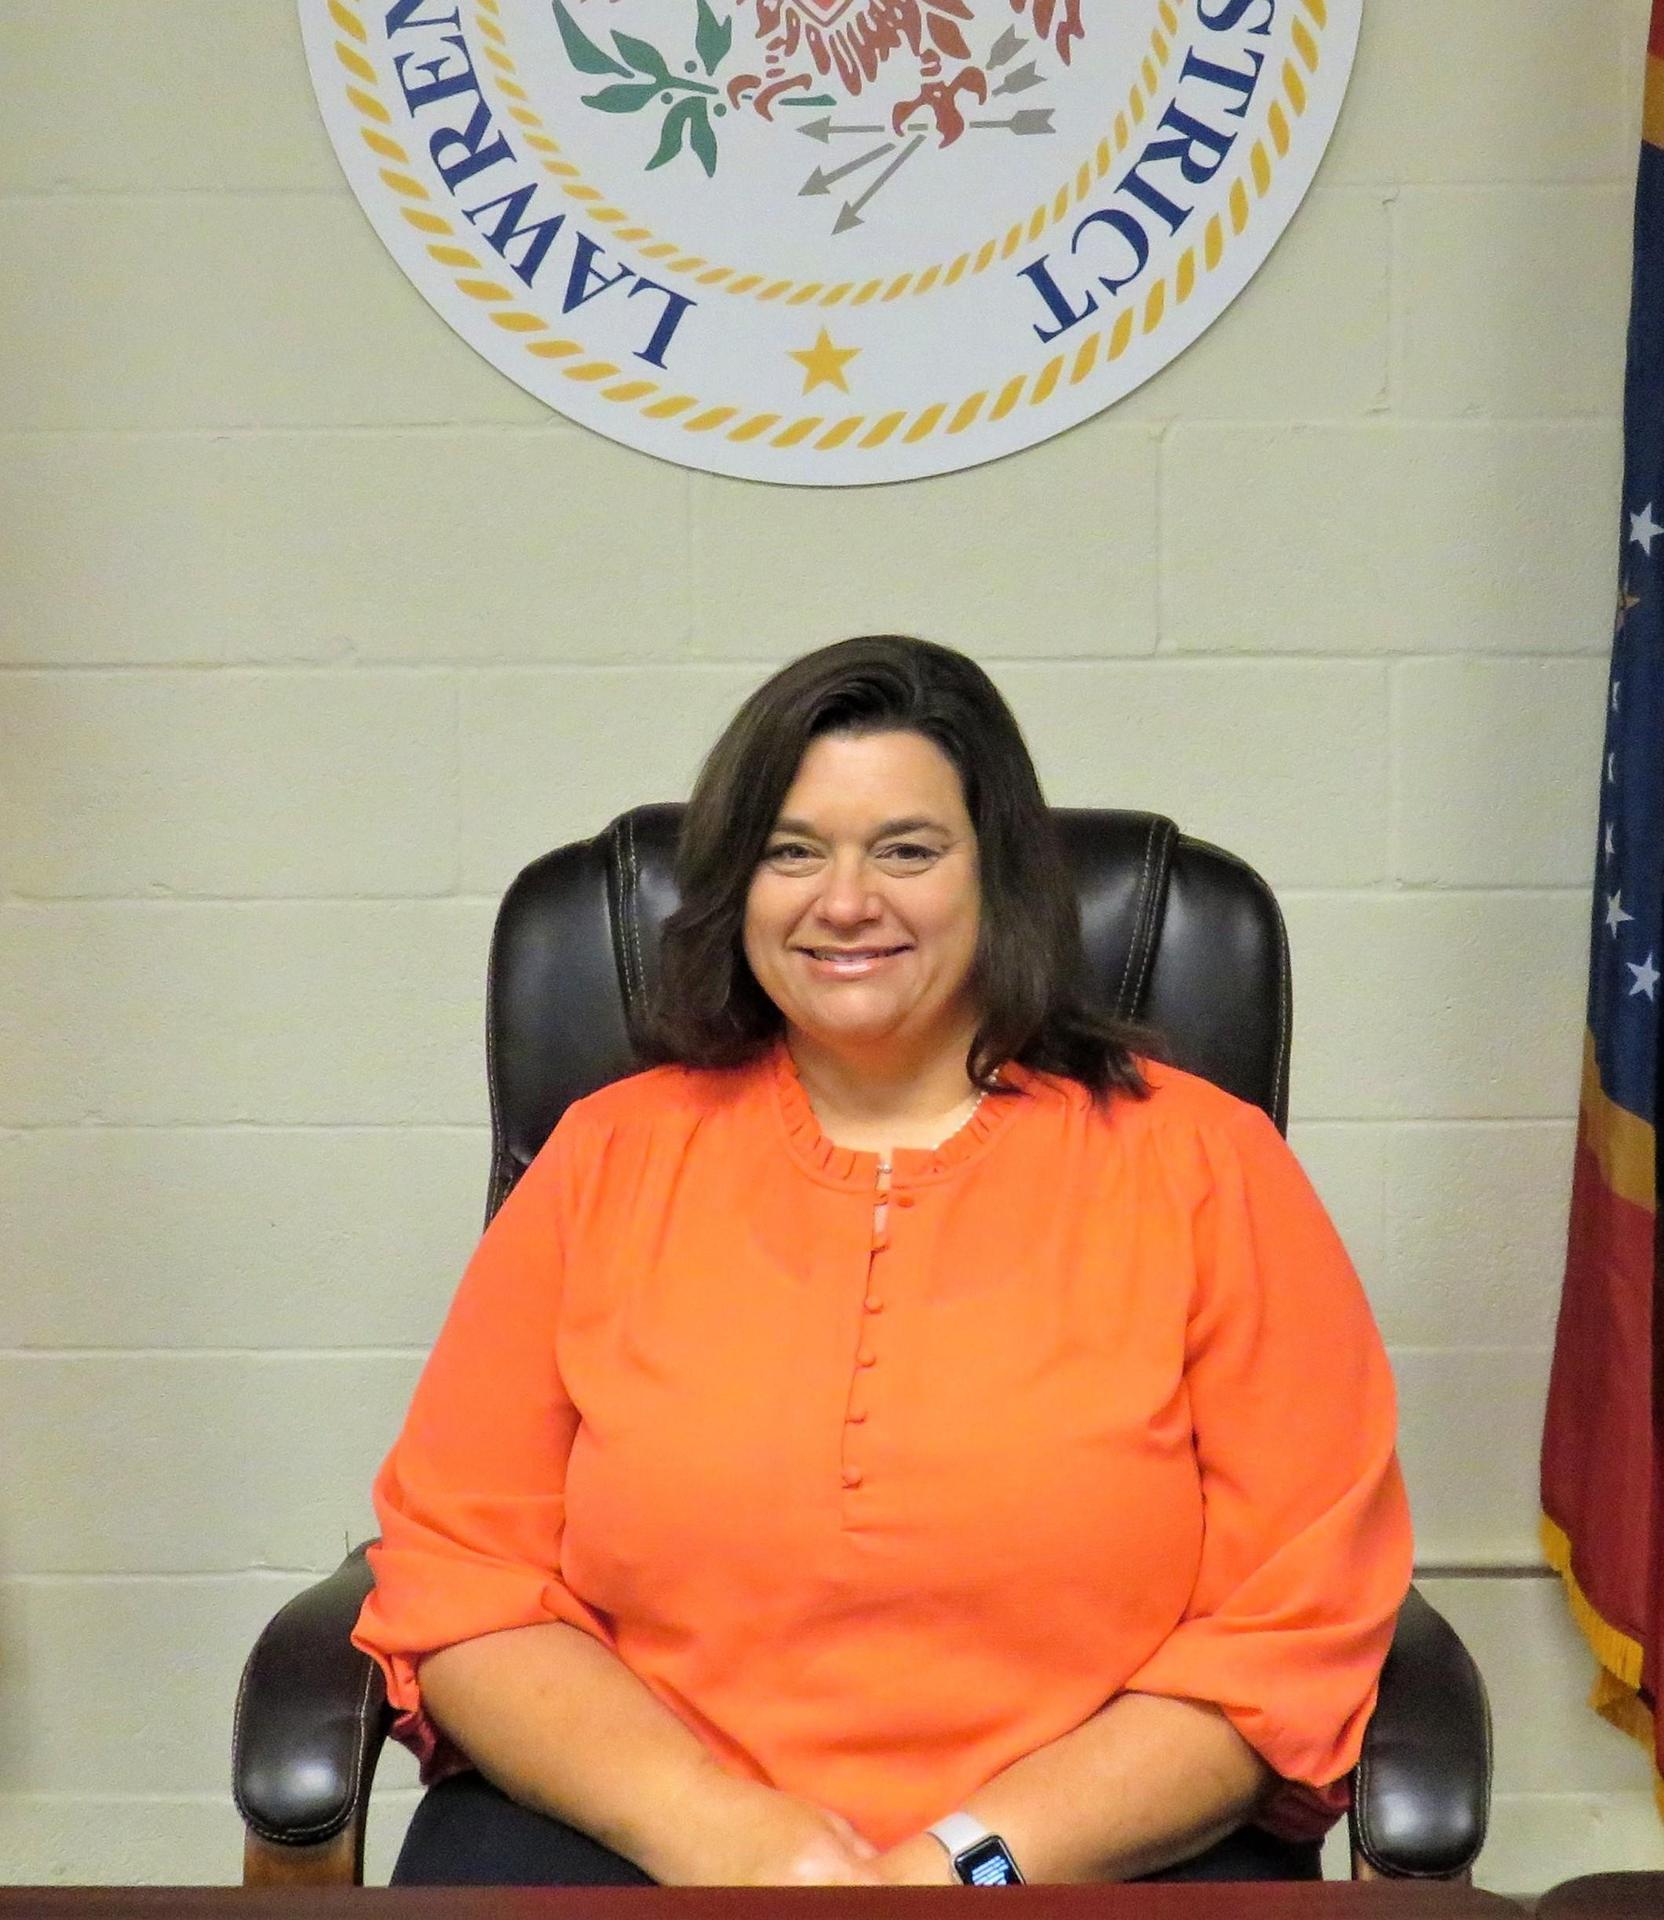 Christy Alexander, Federal Programs Director